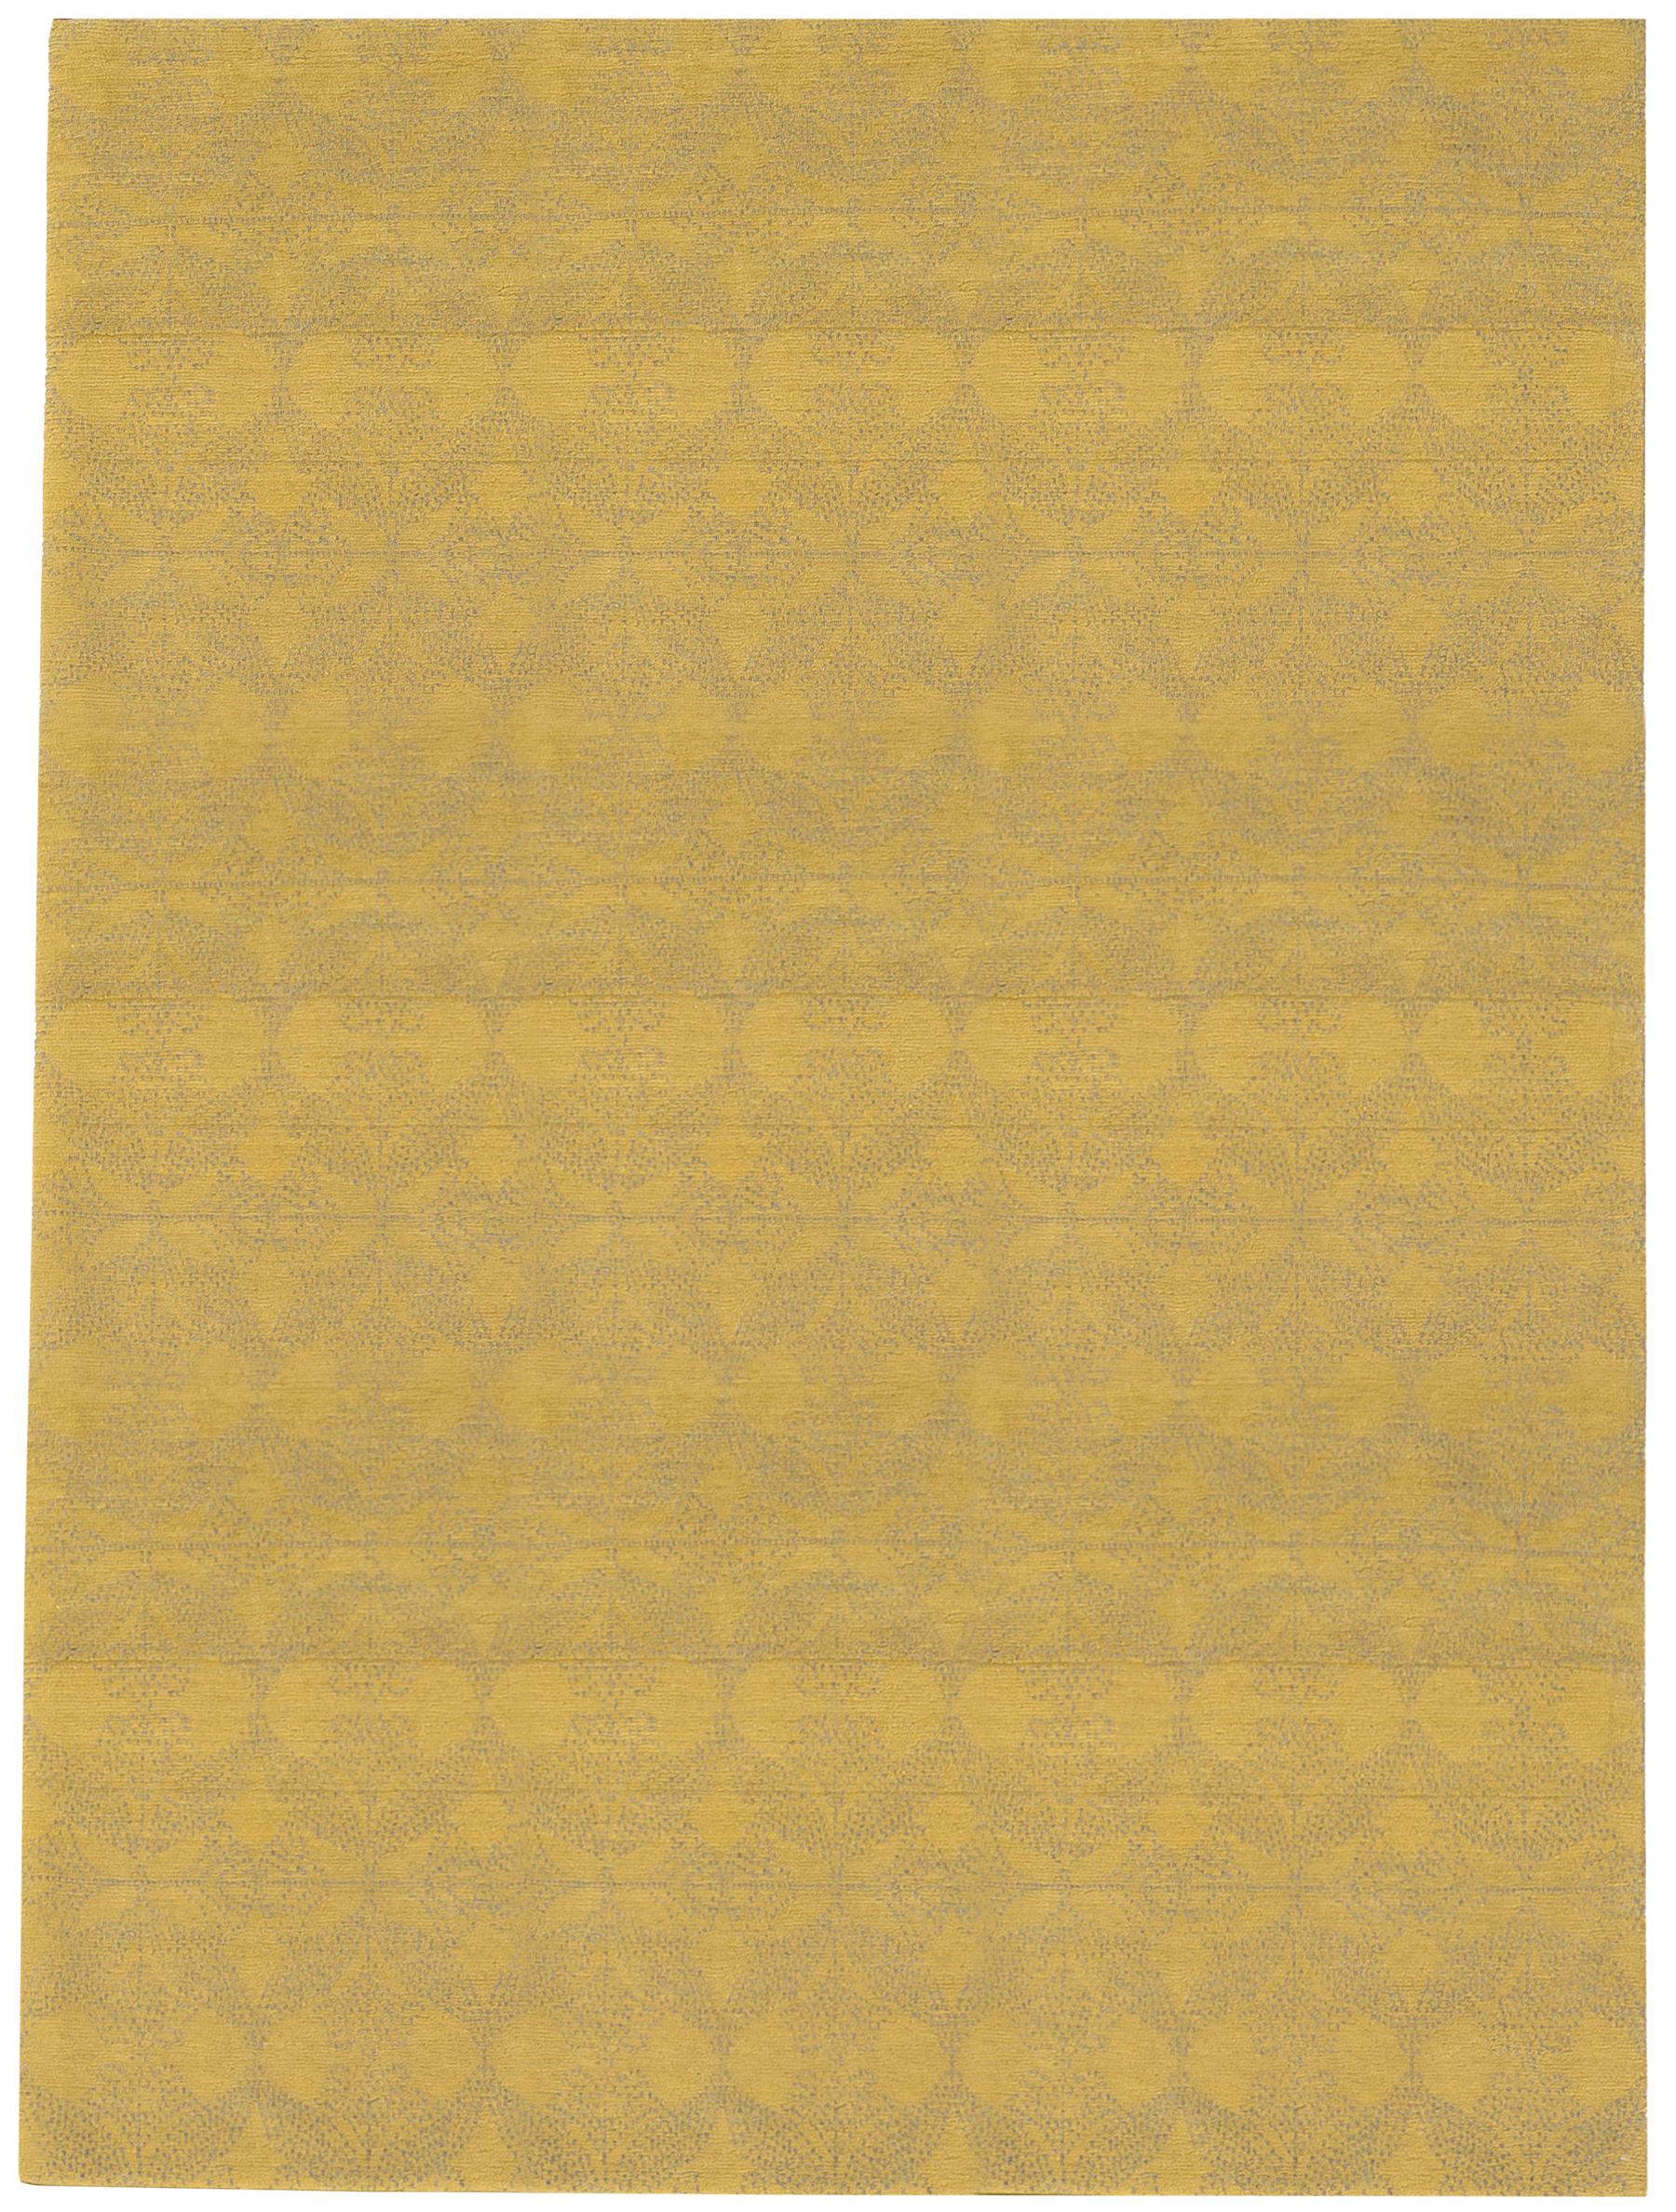 Yardo, Indian Flower, yellow.jpg